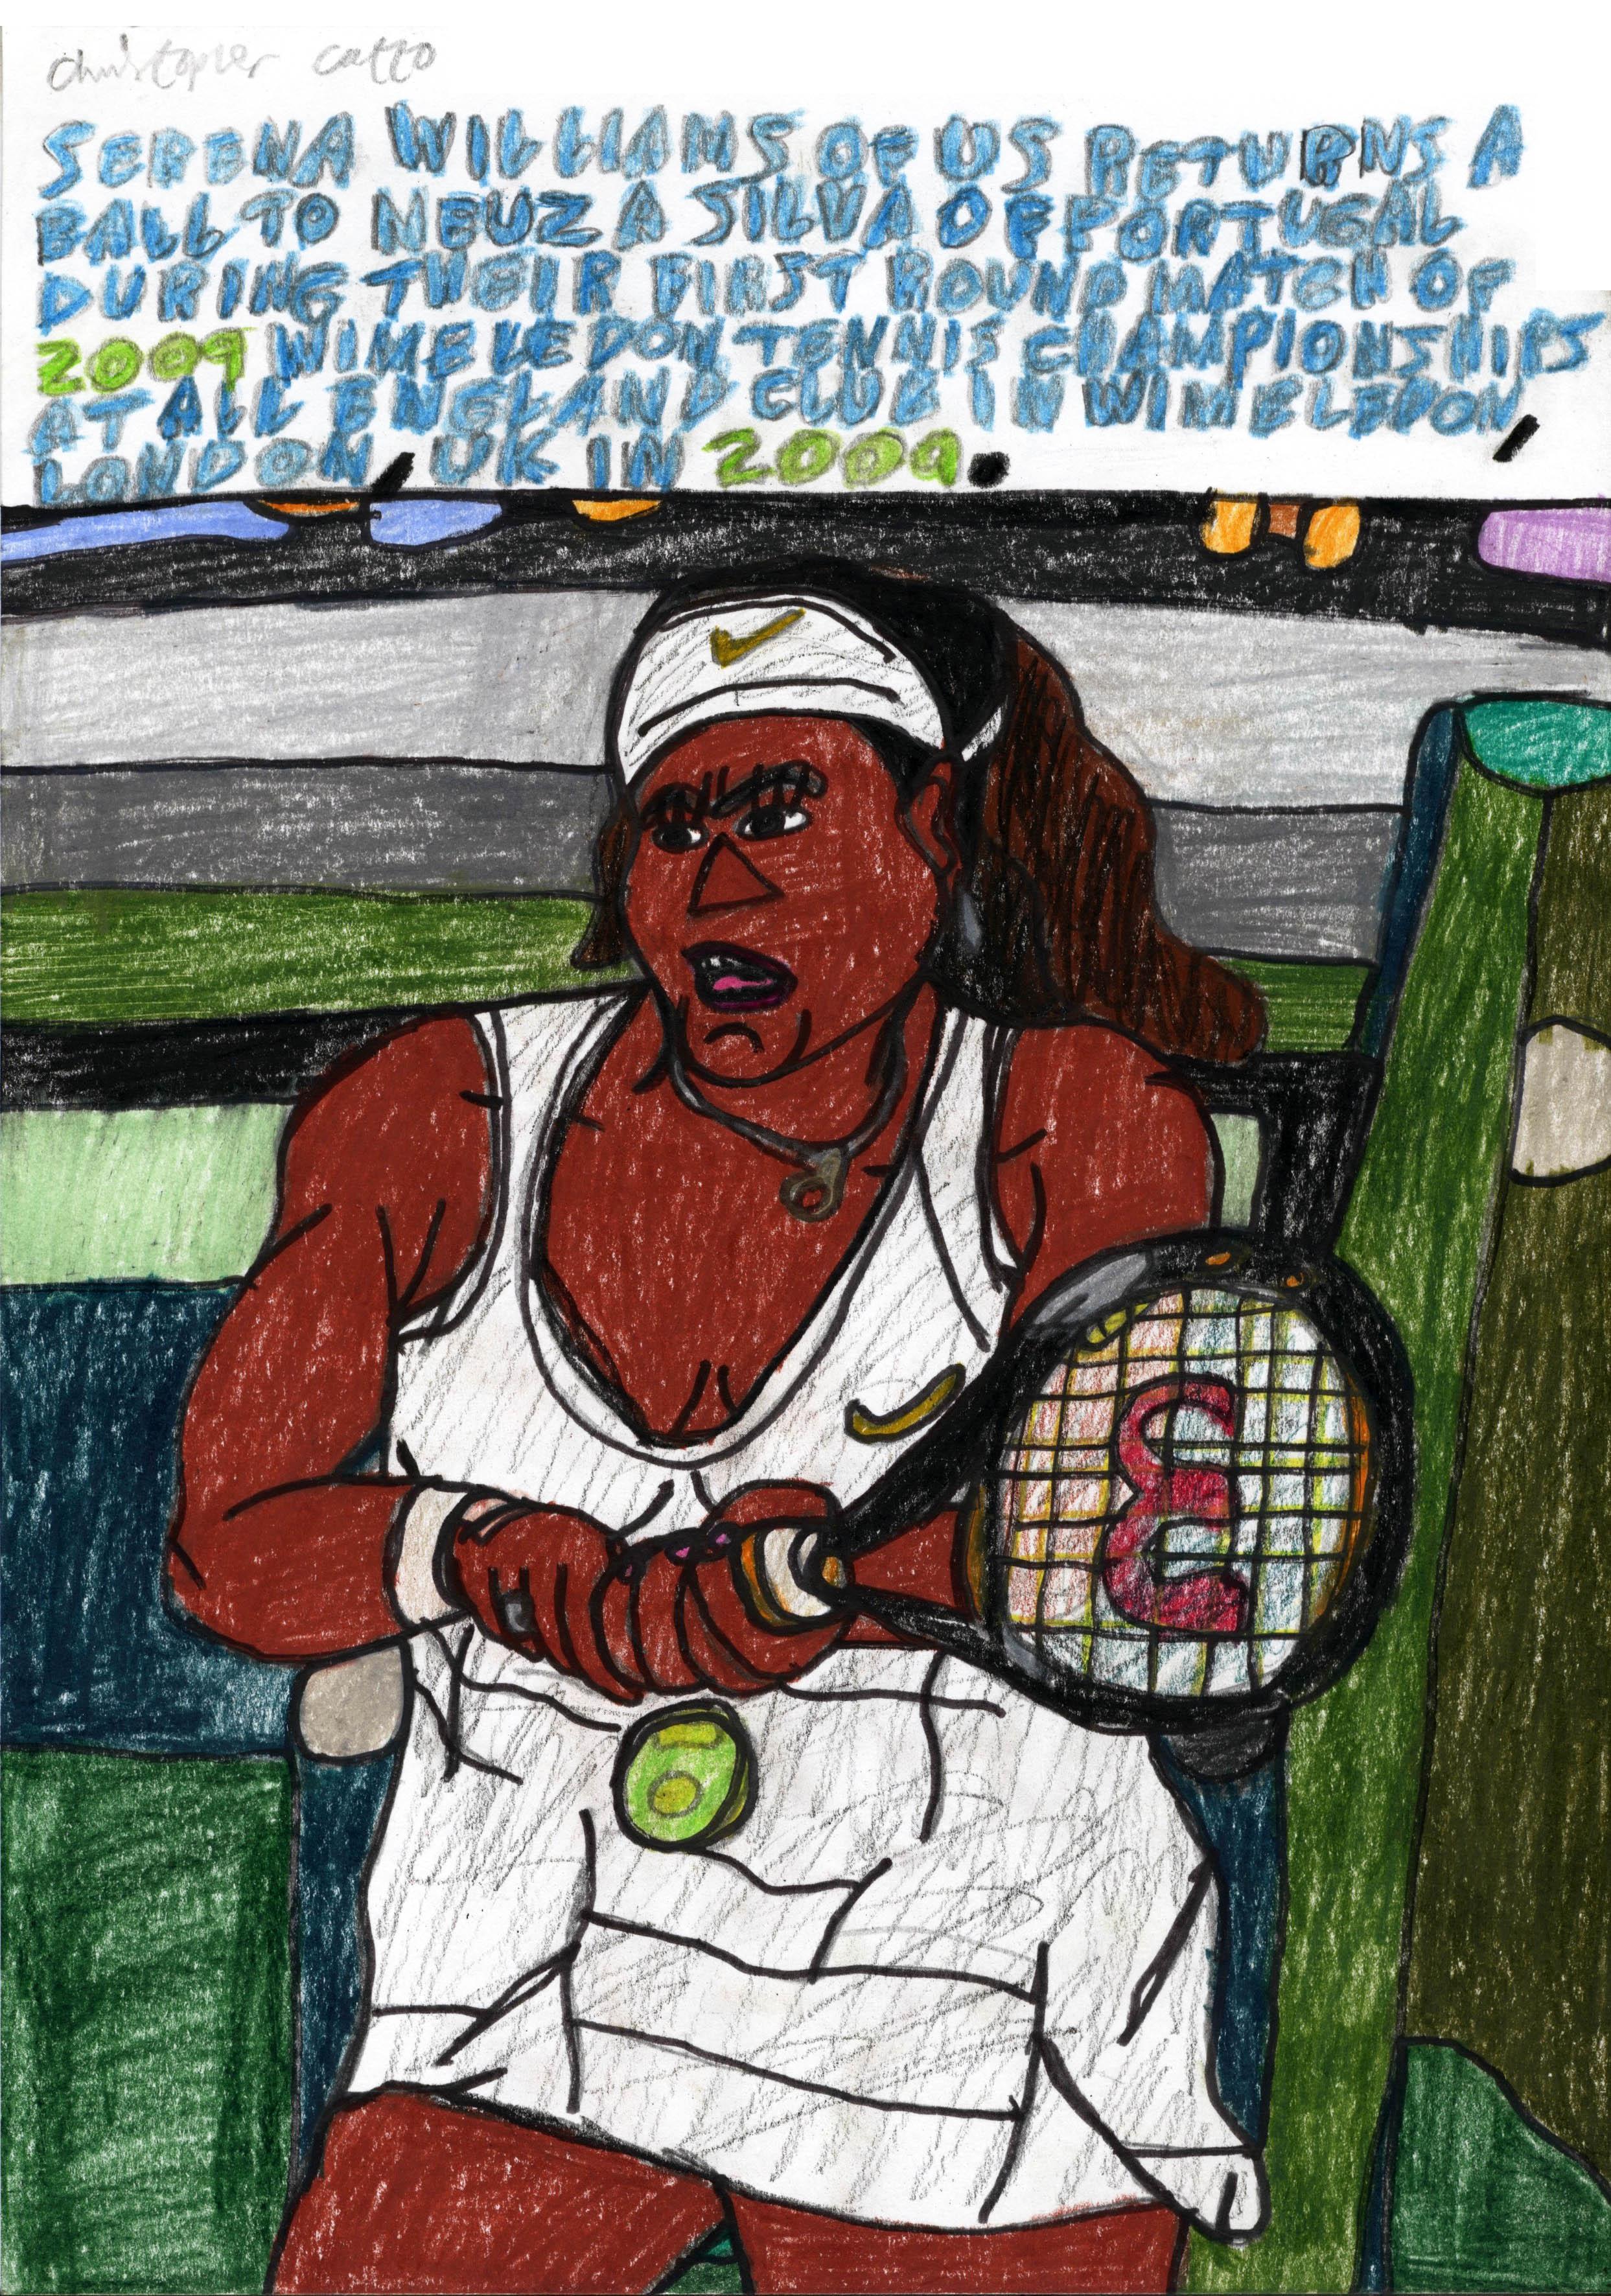 Serena_Williams_02 copy.jpeg